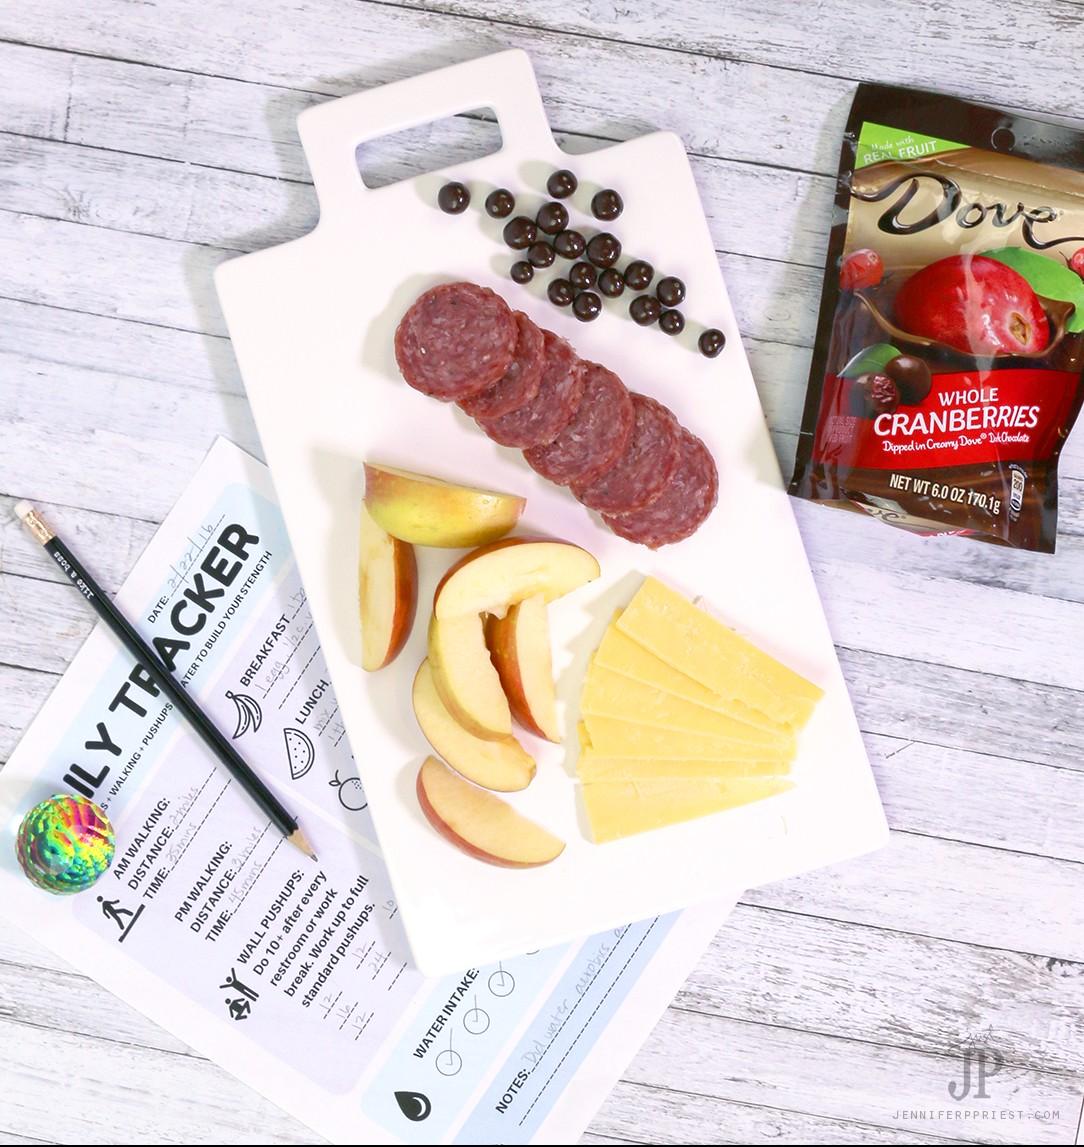 Add-DOVE-Chocolate-Fruit-and-Nut-to-Charcuterie-JustJP-Jenniferppriest